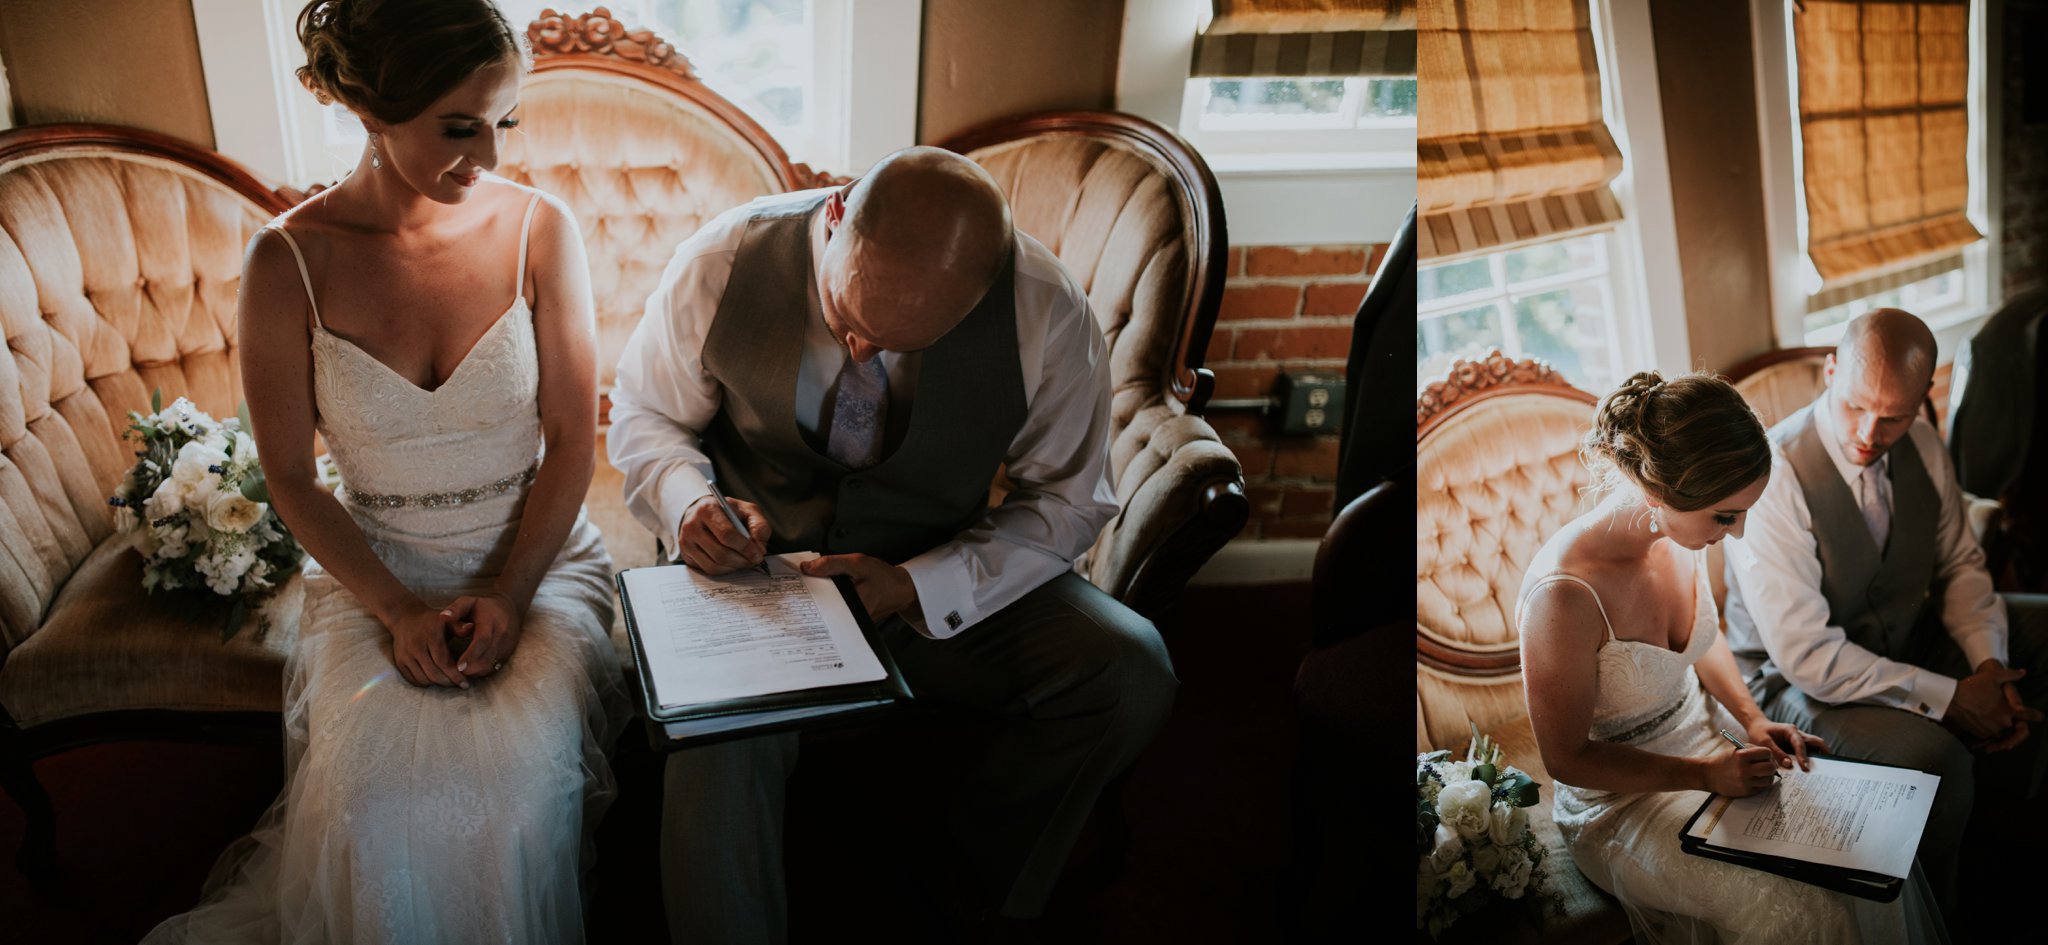 hollywood-school-house-wedding-seattle-photographer-caitlyn-nikula-83.jpg